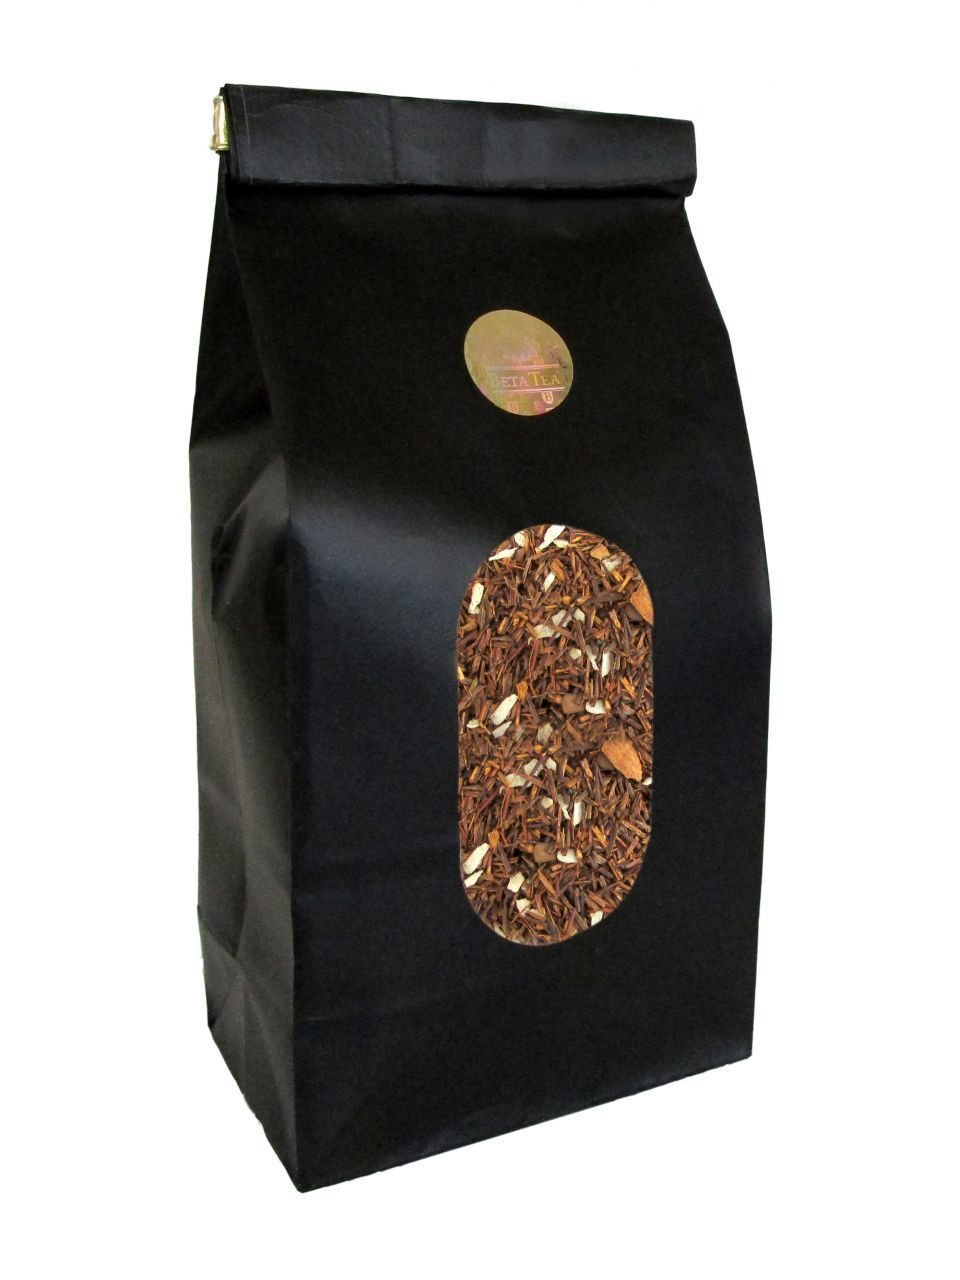 Beta Trà Chocolate Trà Rooibos 50gr Gree Cây Healt Làm Đẹp Giảm Béo